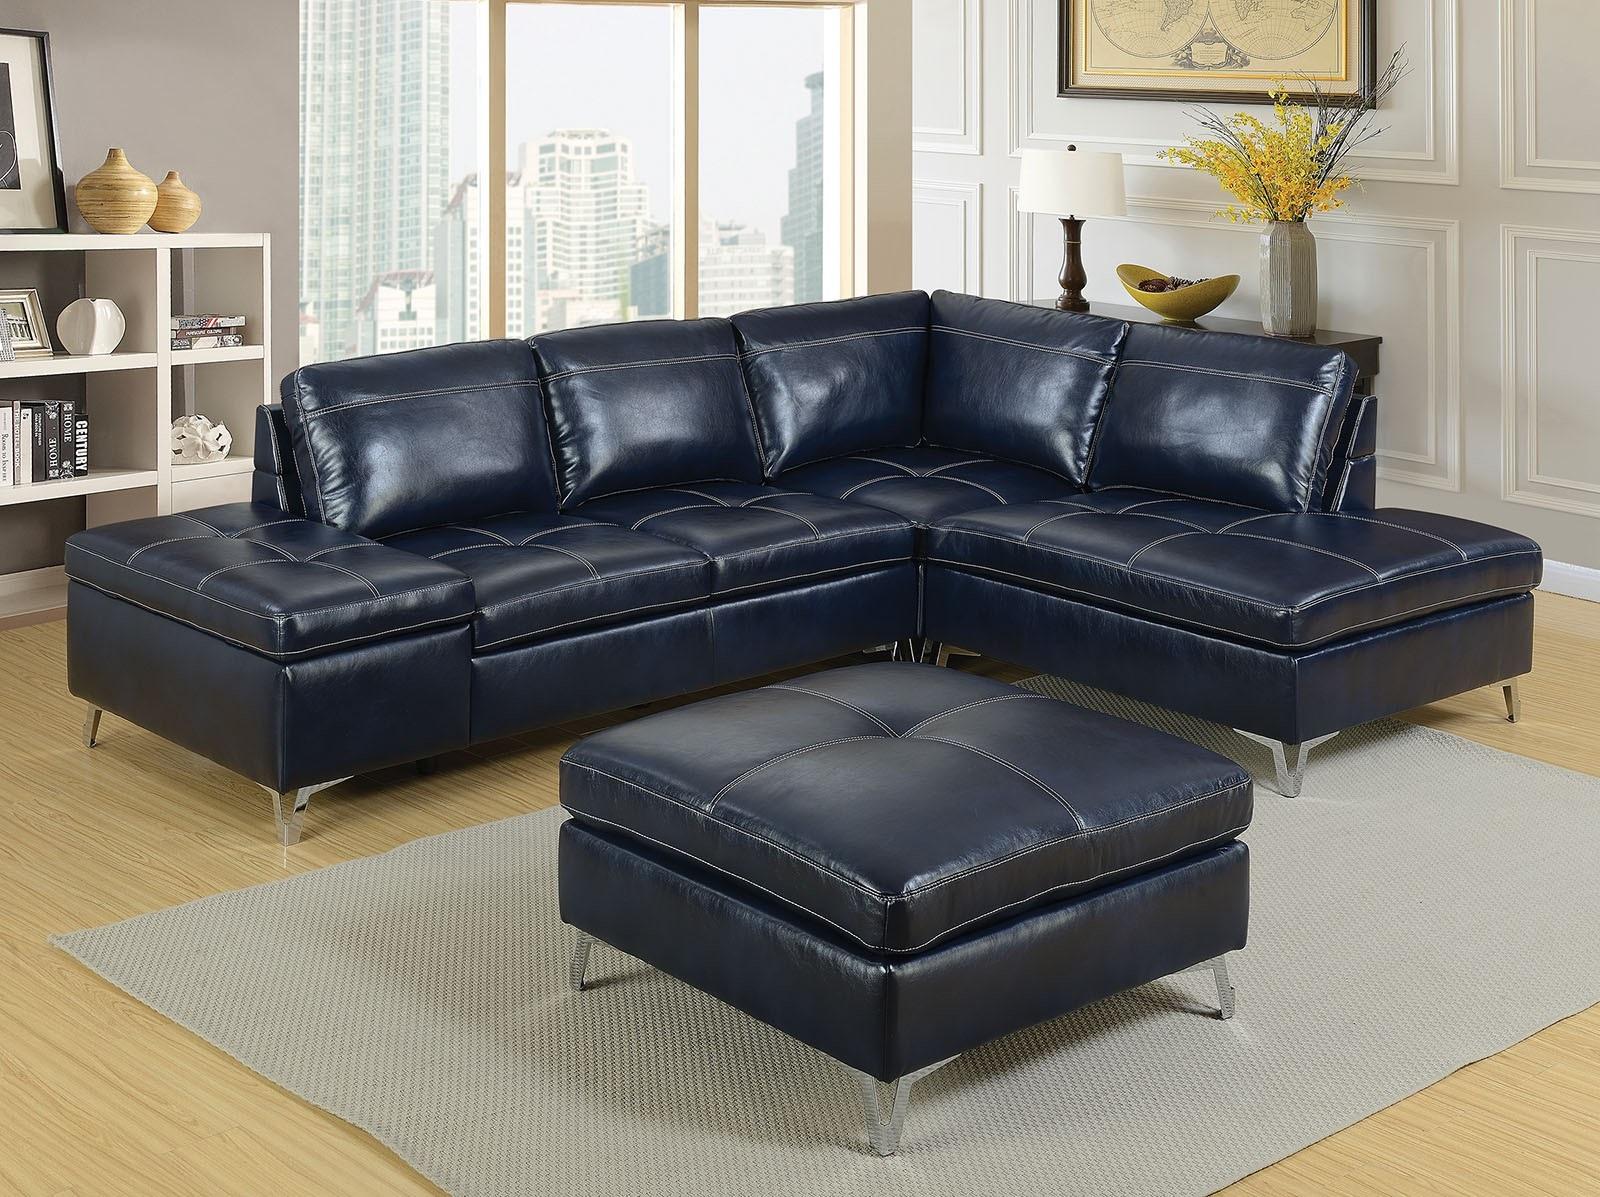 4pc Dark Blue Sectional Sofa Corner Loveseat W Storage Ottoman Living Room Set